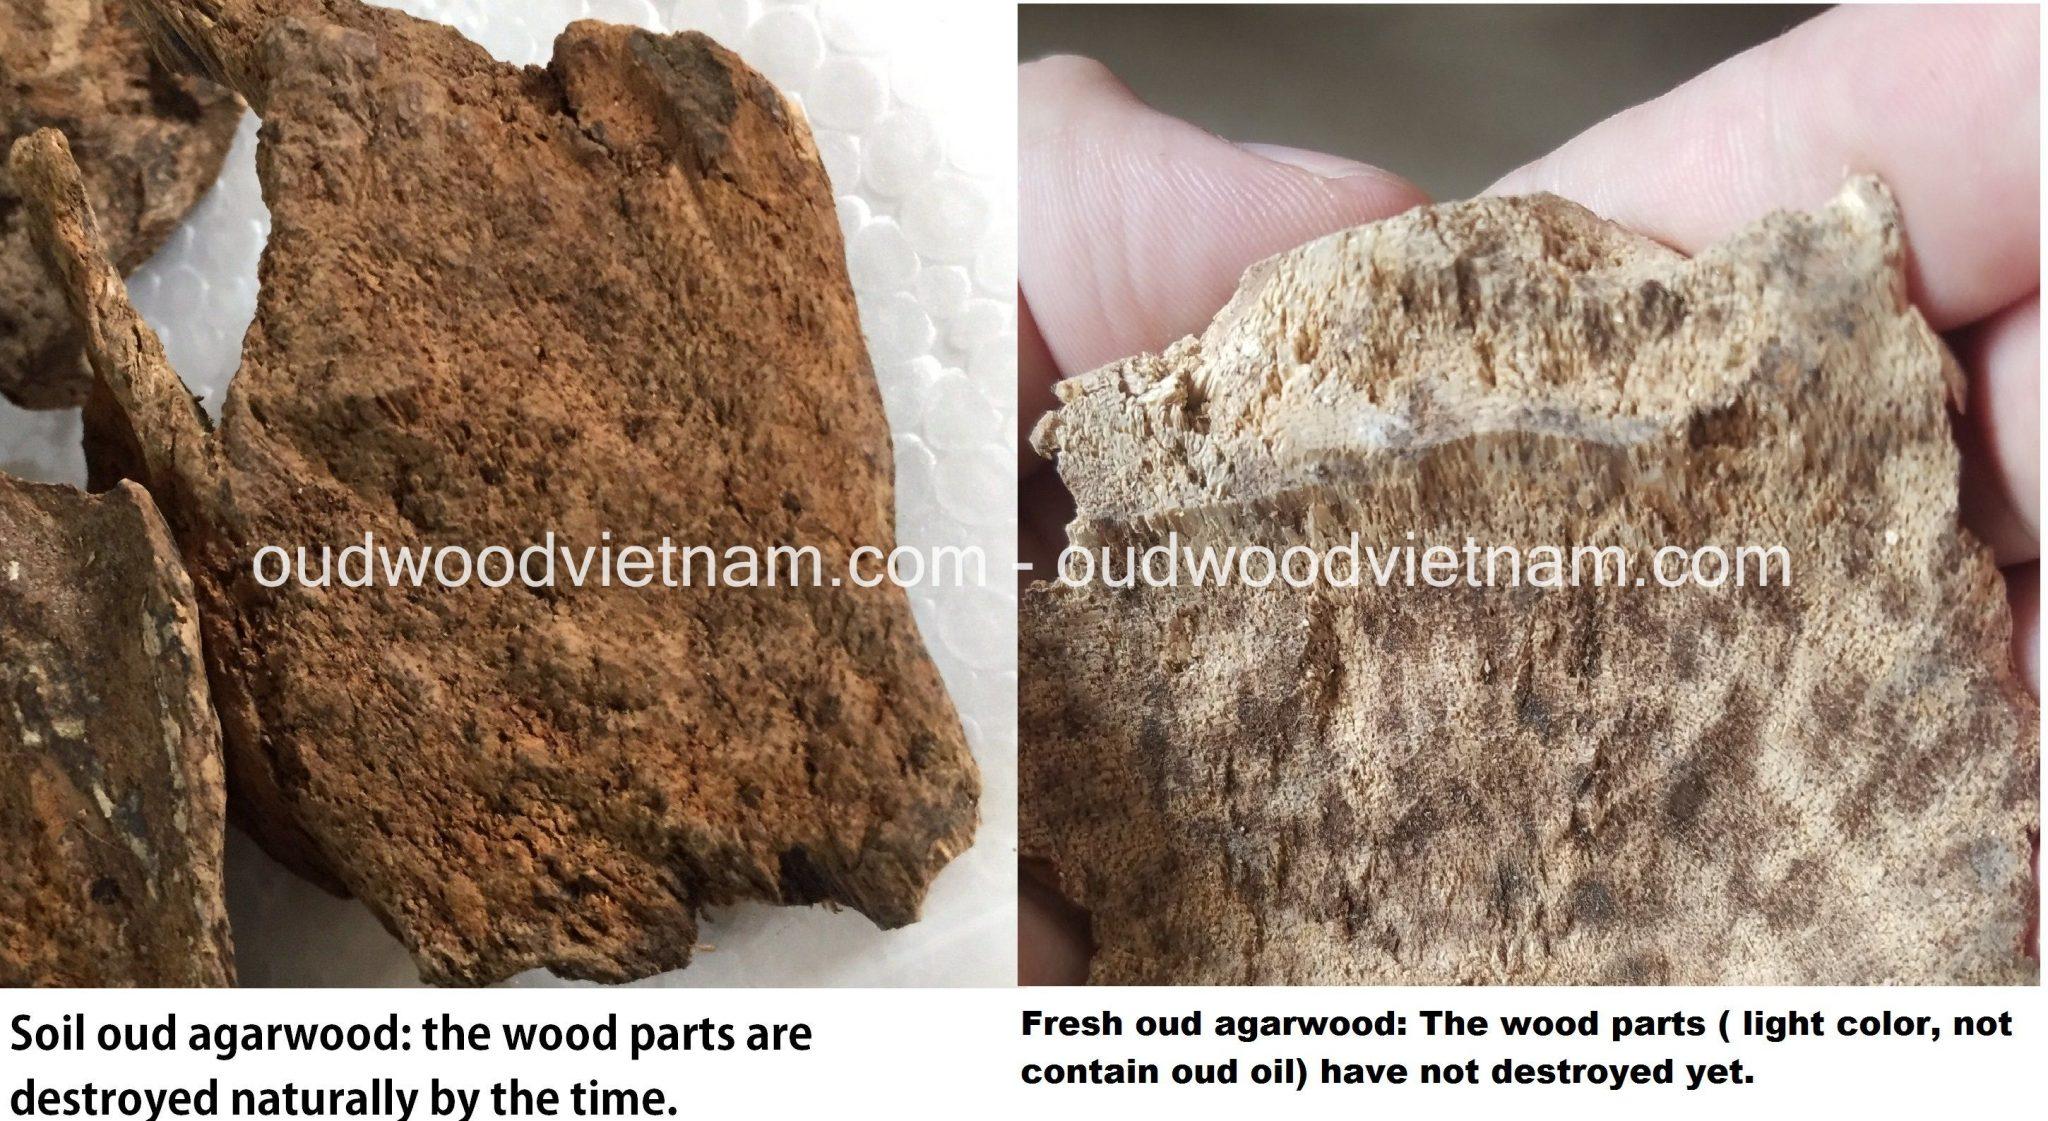 Soil oud agarwood vs fresh oud agarwood